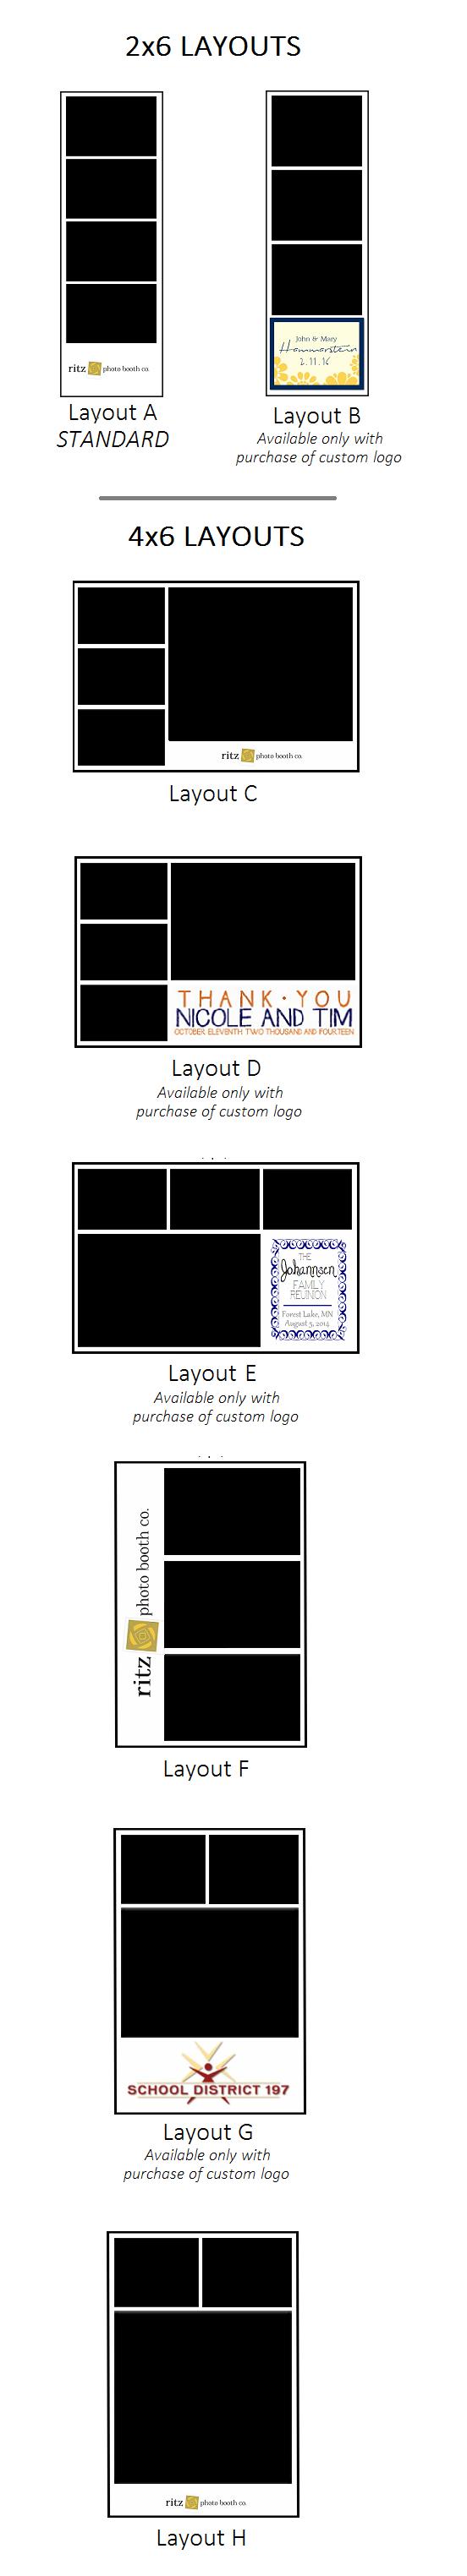 photo booth print layouts 2x6 4x6